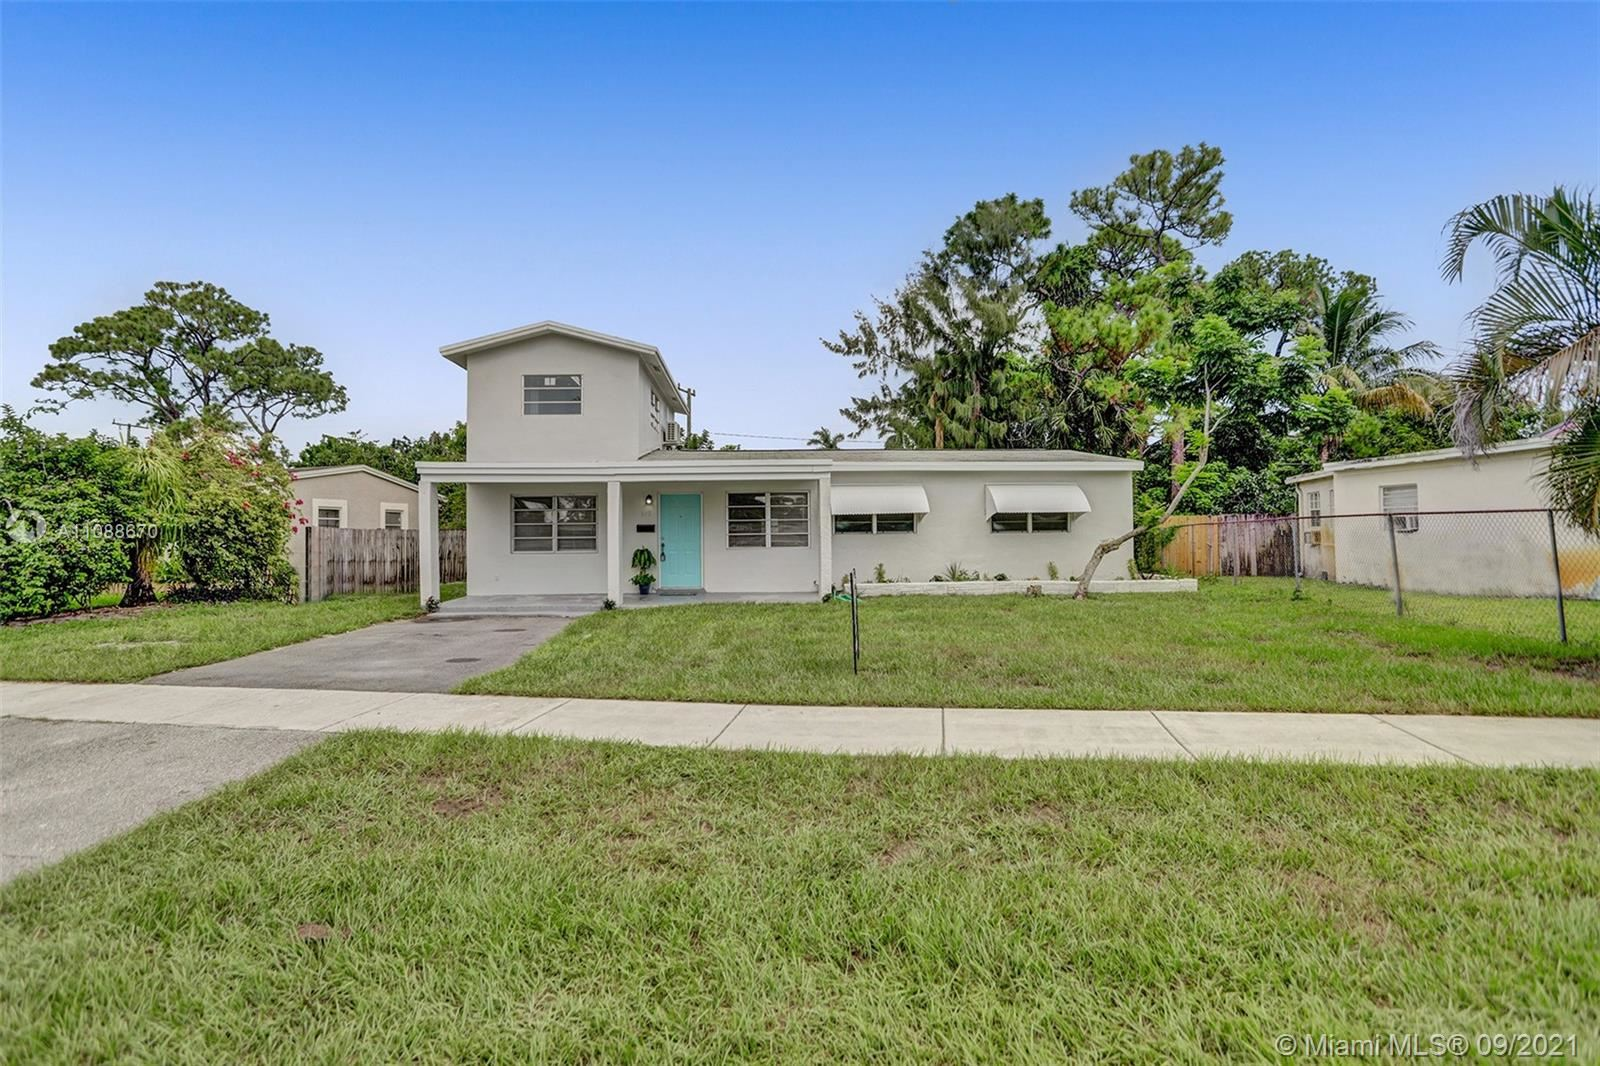 650 E Dayton Cir, Fort Lauderdale, FL 33312 - #: A11088670